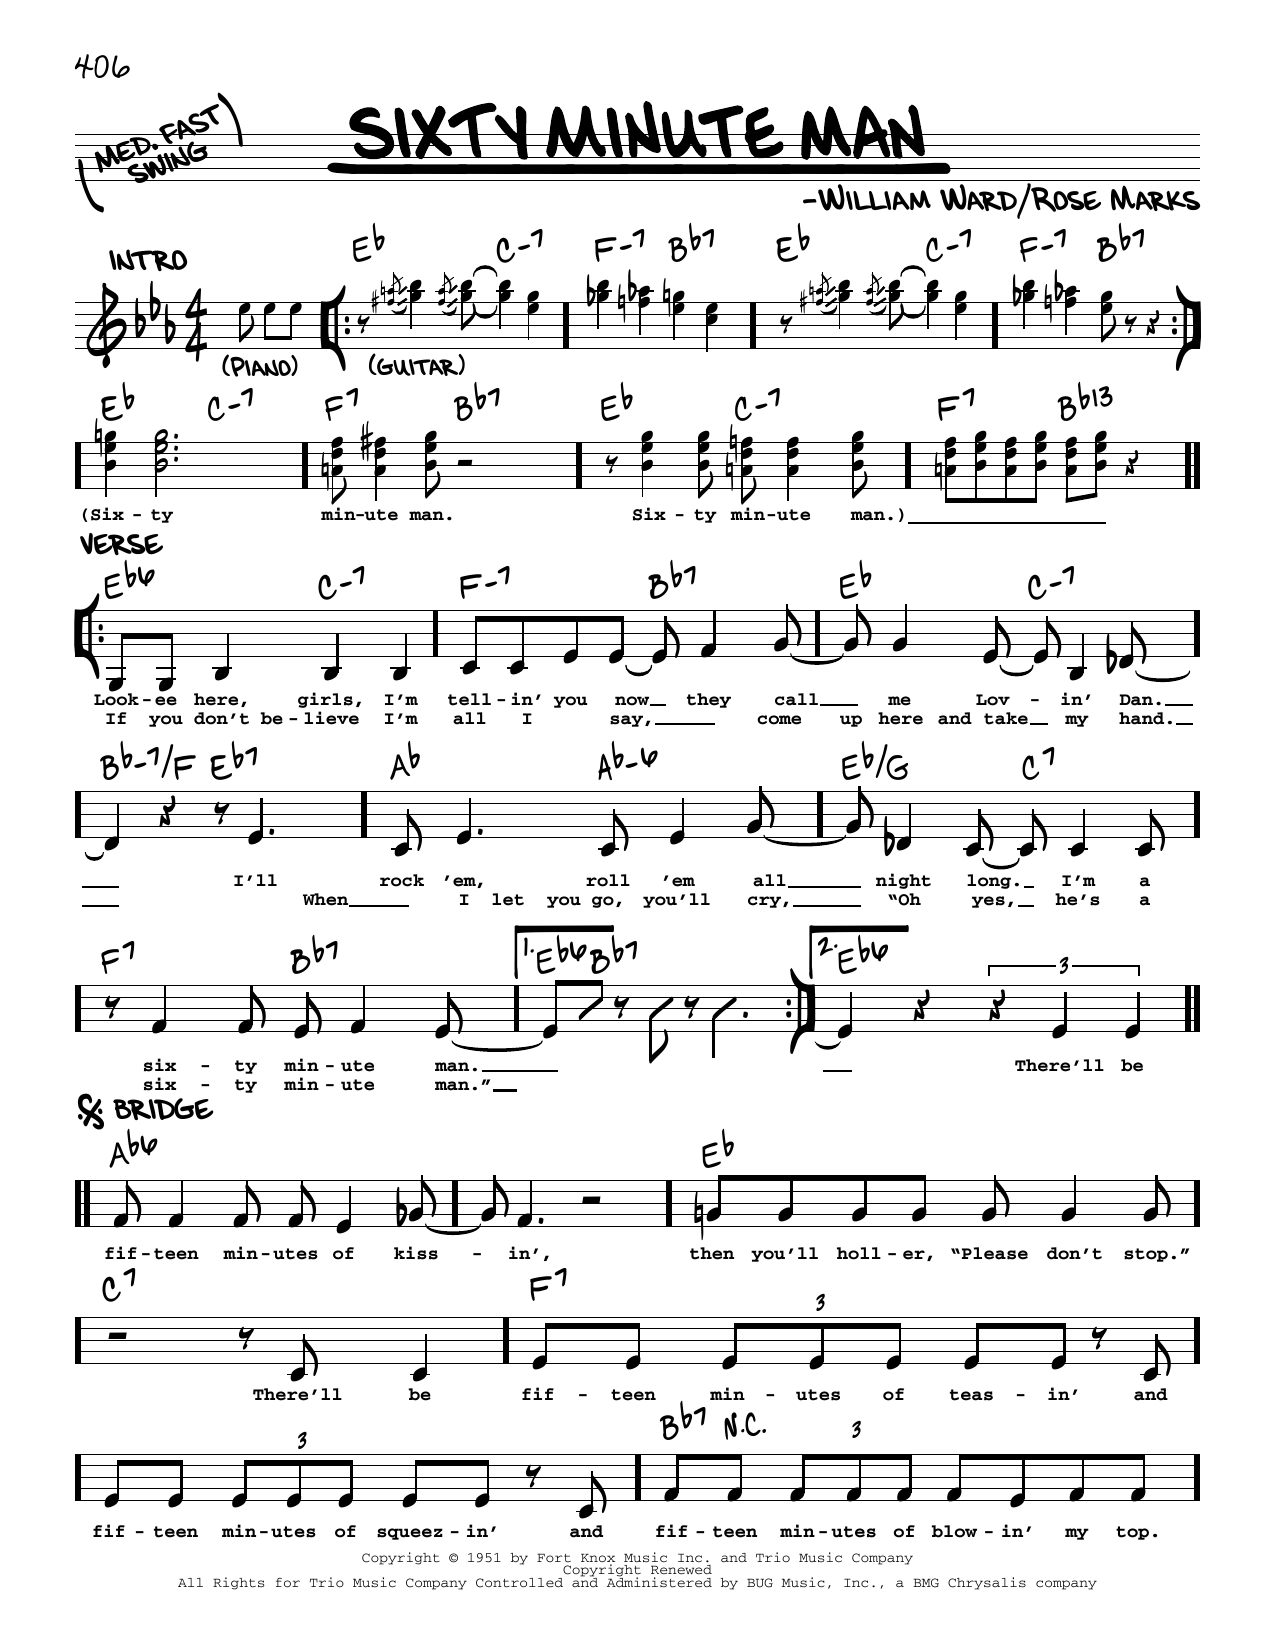 Sixty Minute Man Sheet Music